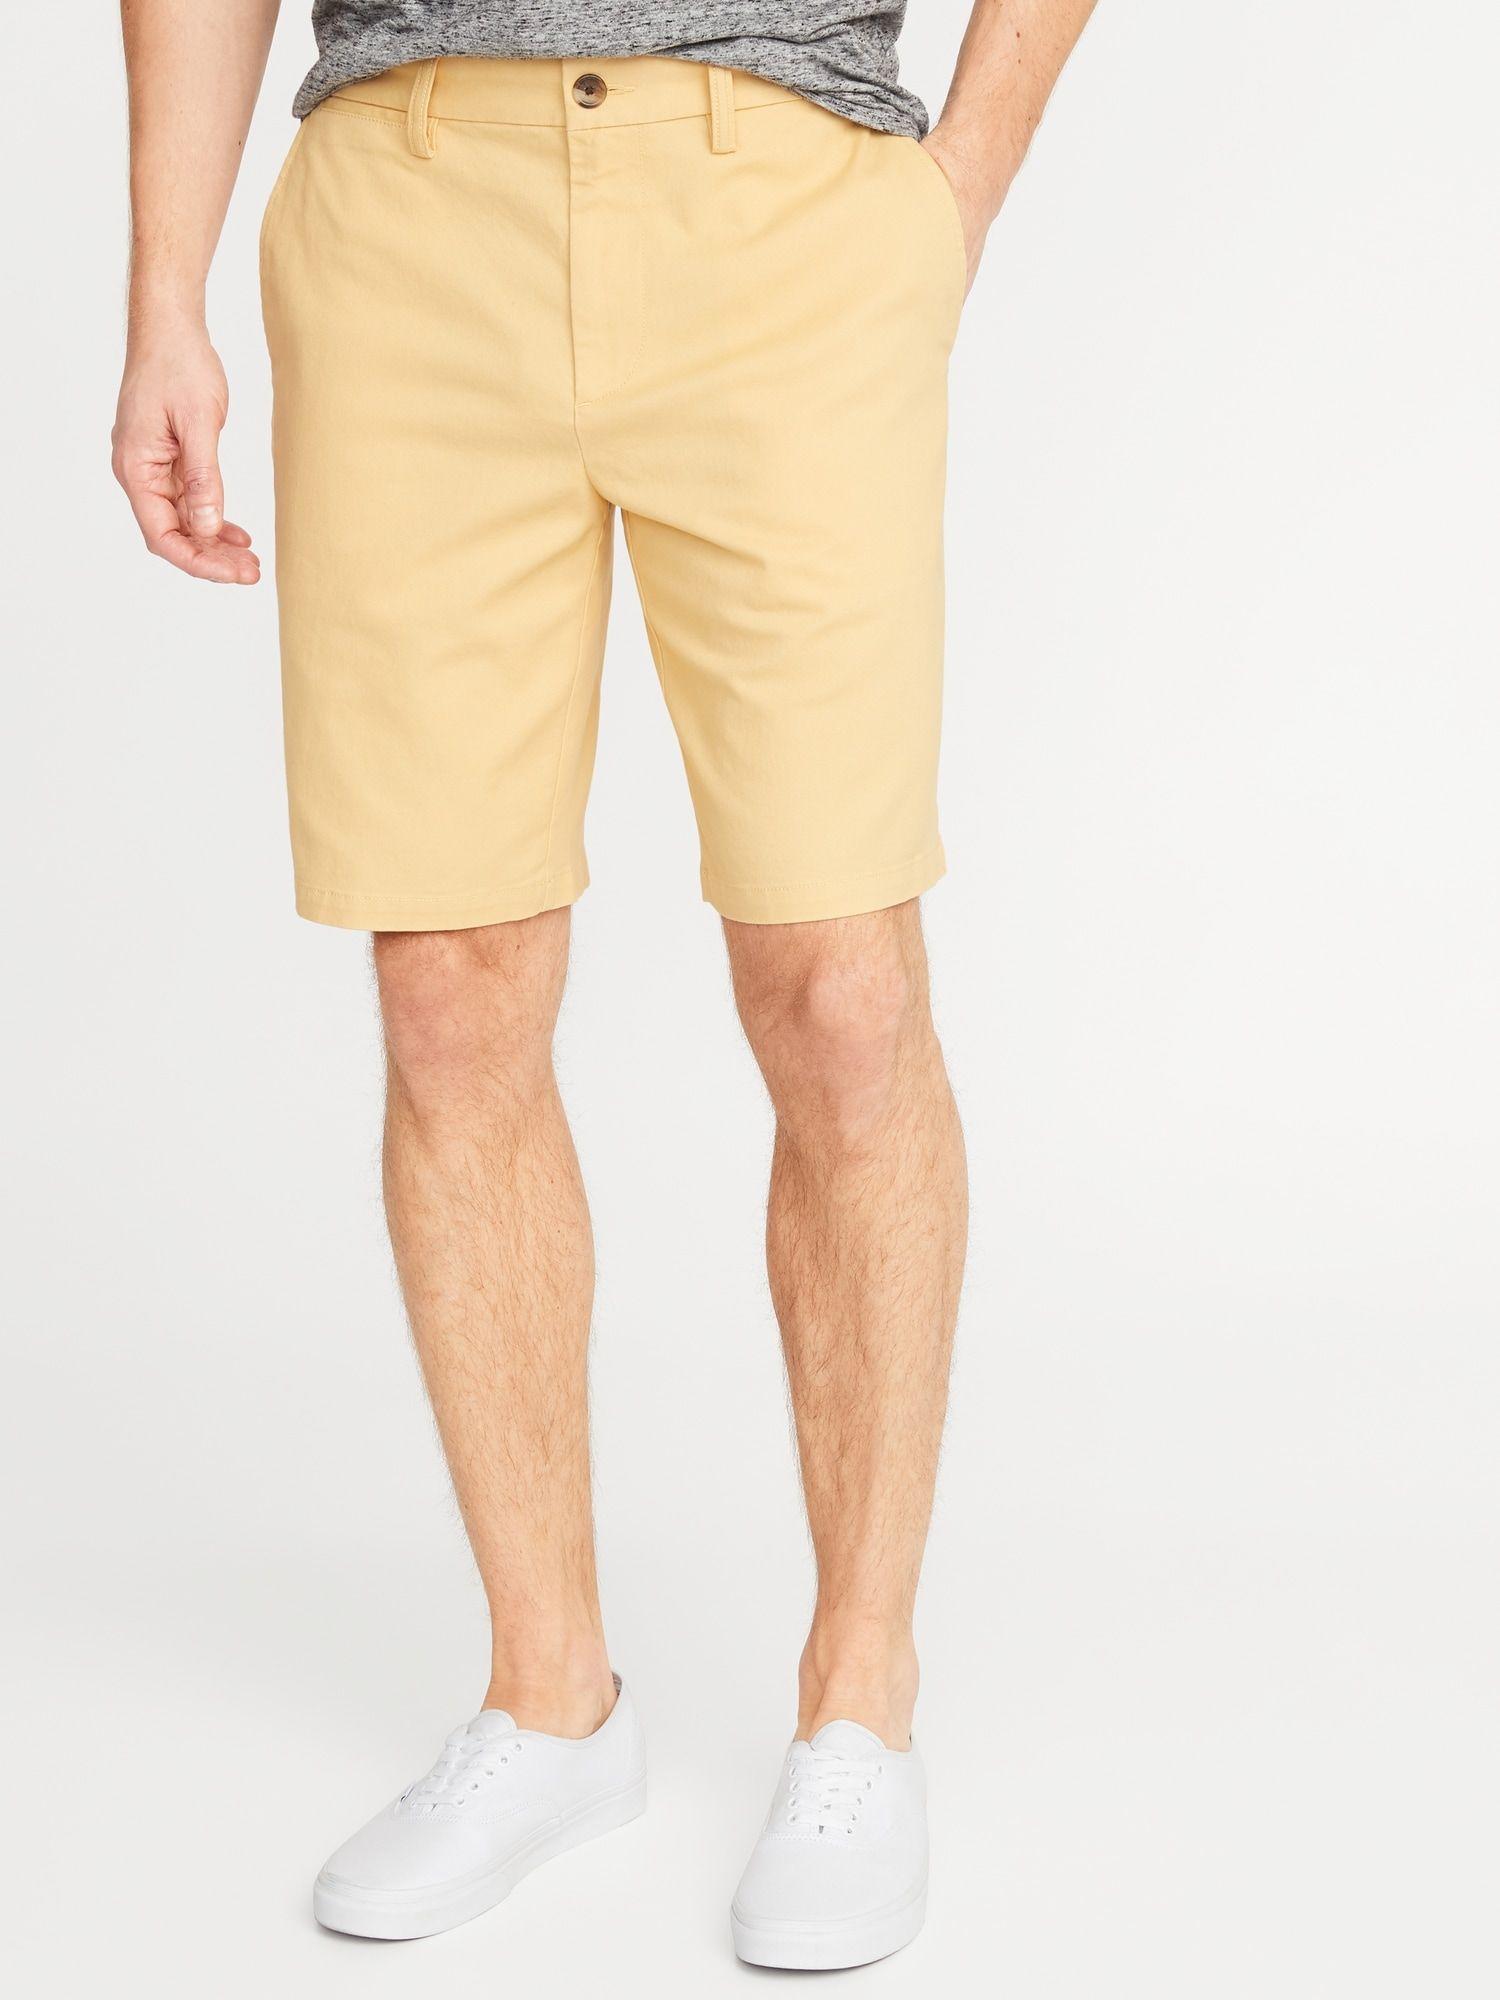 739939c9486 Slim Ultimate Built-In Flex Shorts for Men -10-inch inseam in 2019 ...